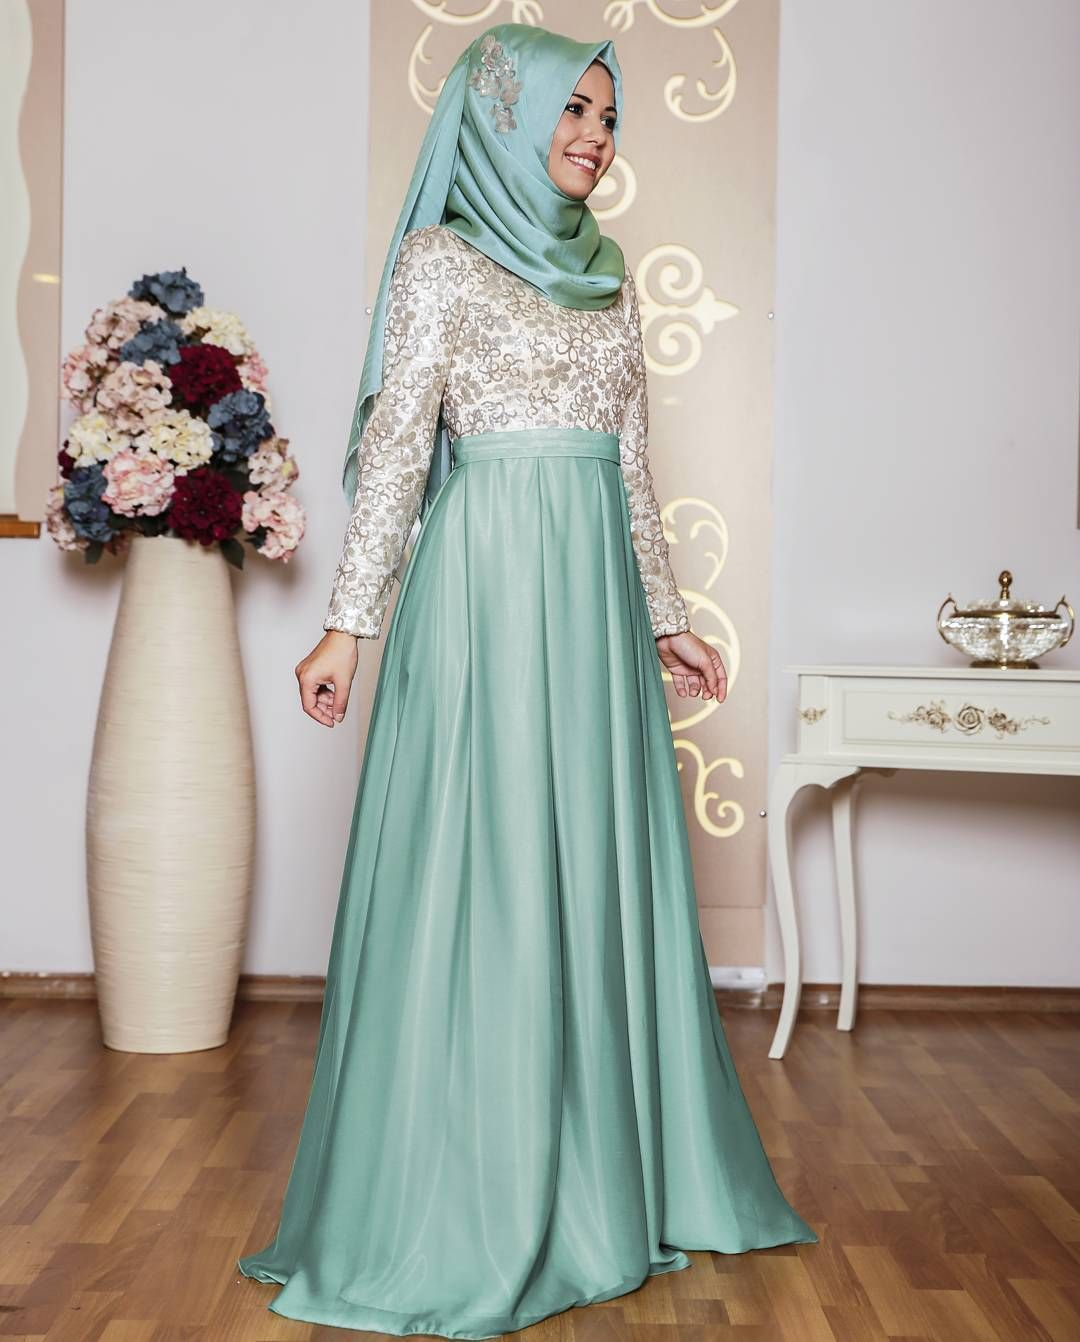 Pin by CoffeeGurl LoveBooks~ on Hijabista ~~ | Pinterest | Muslim ...